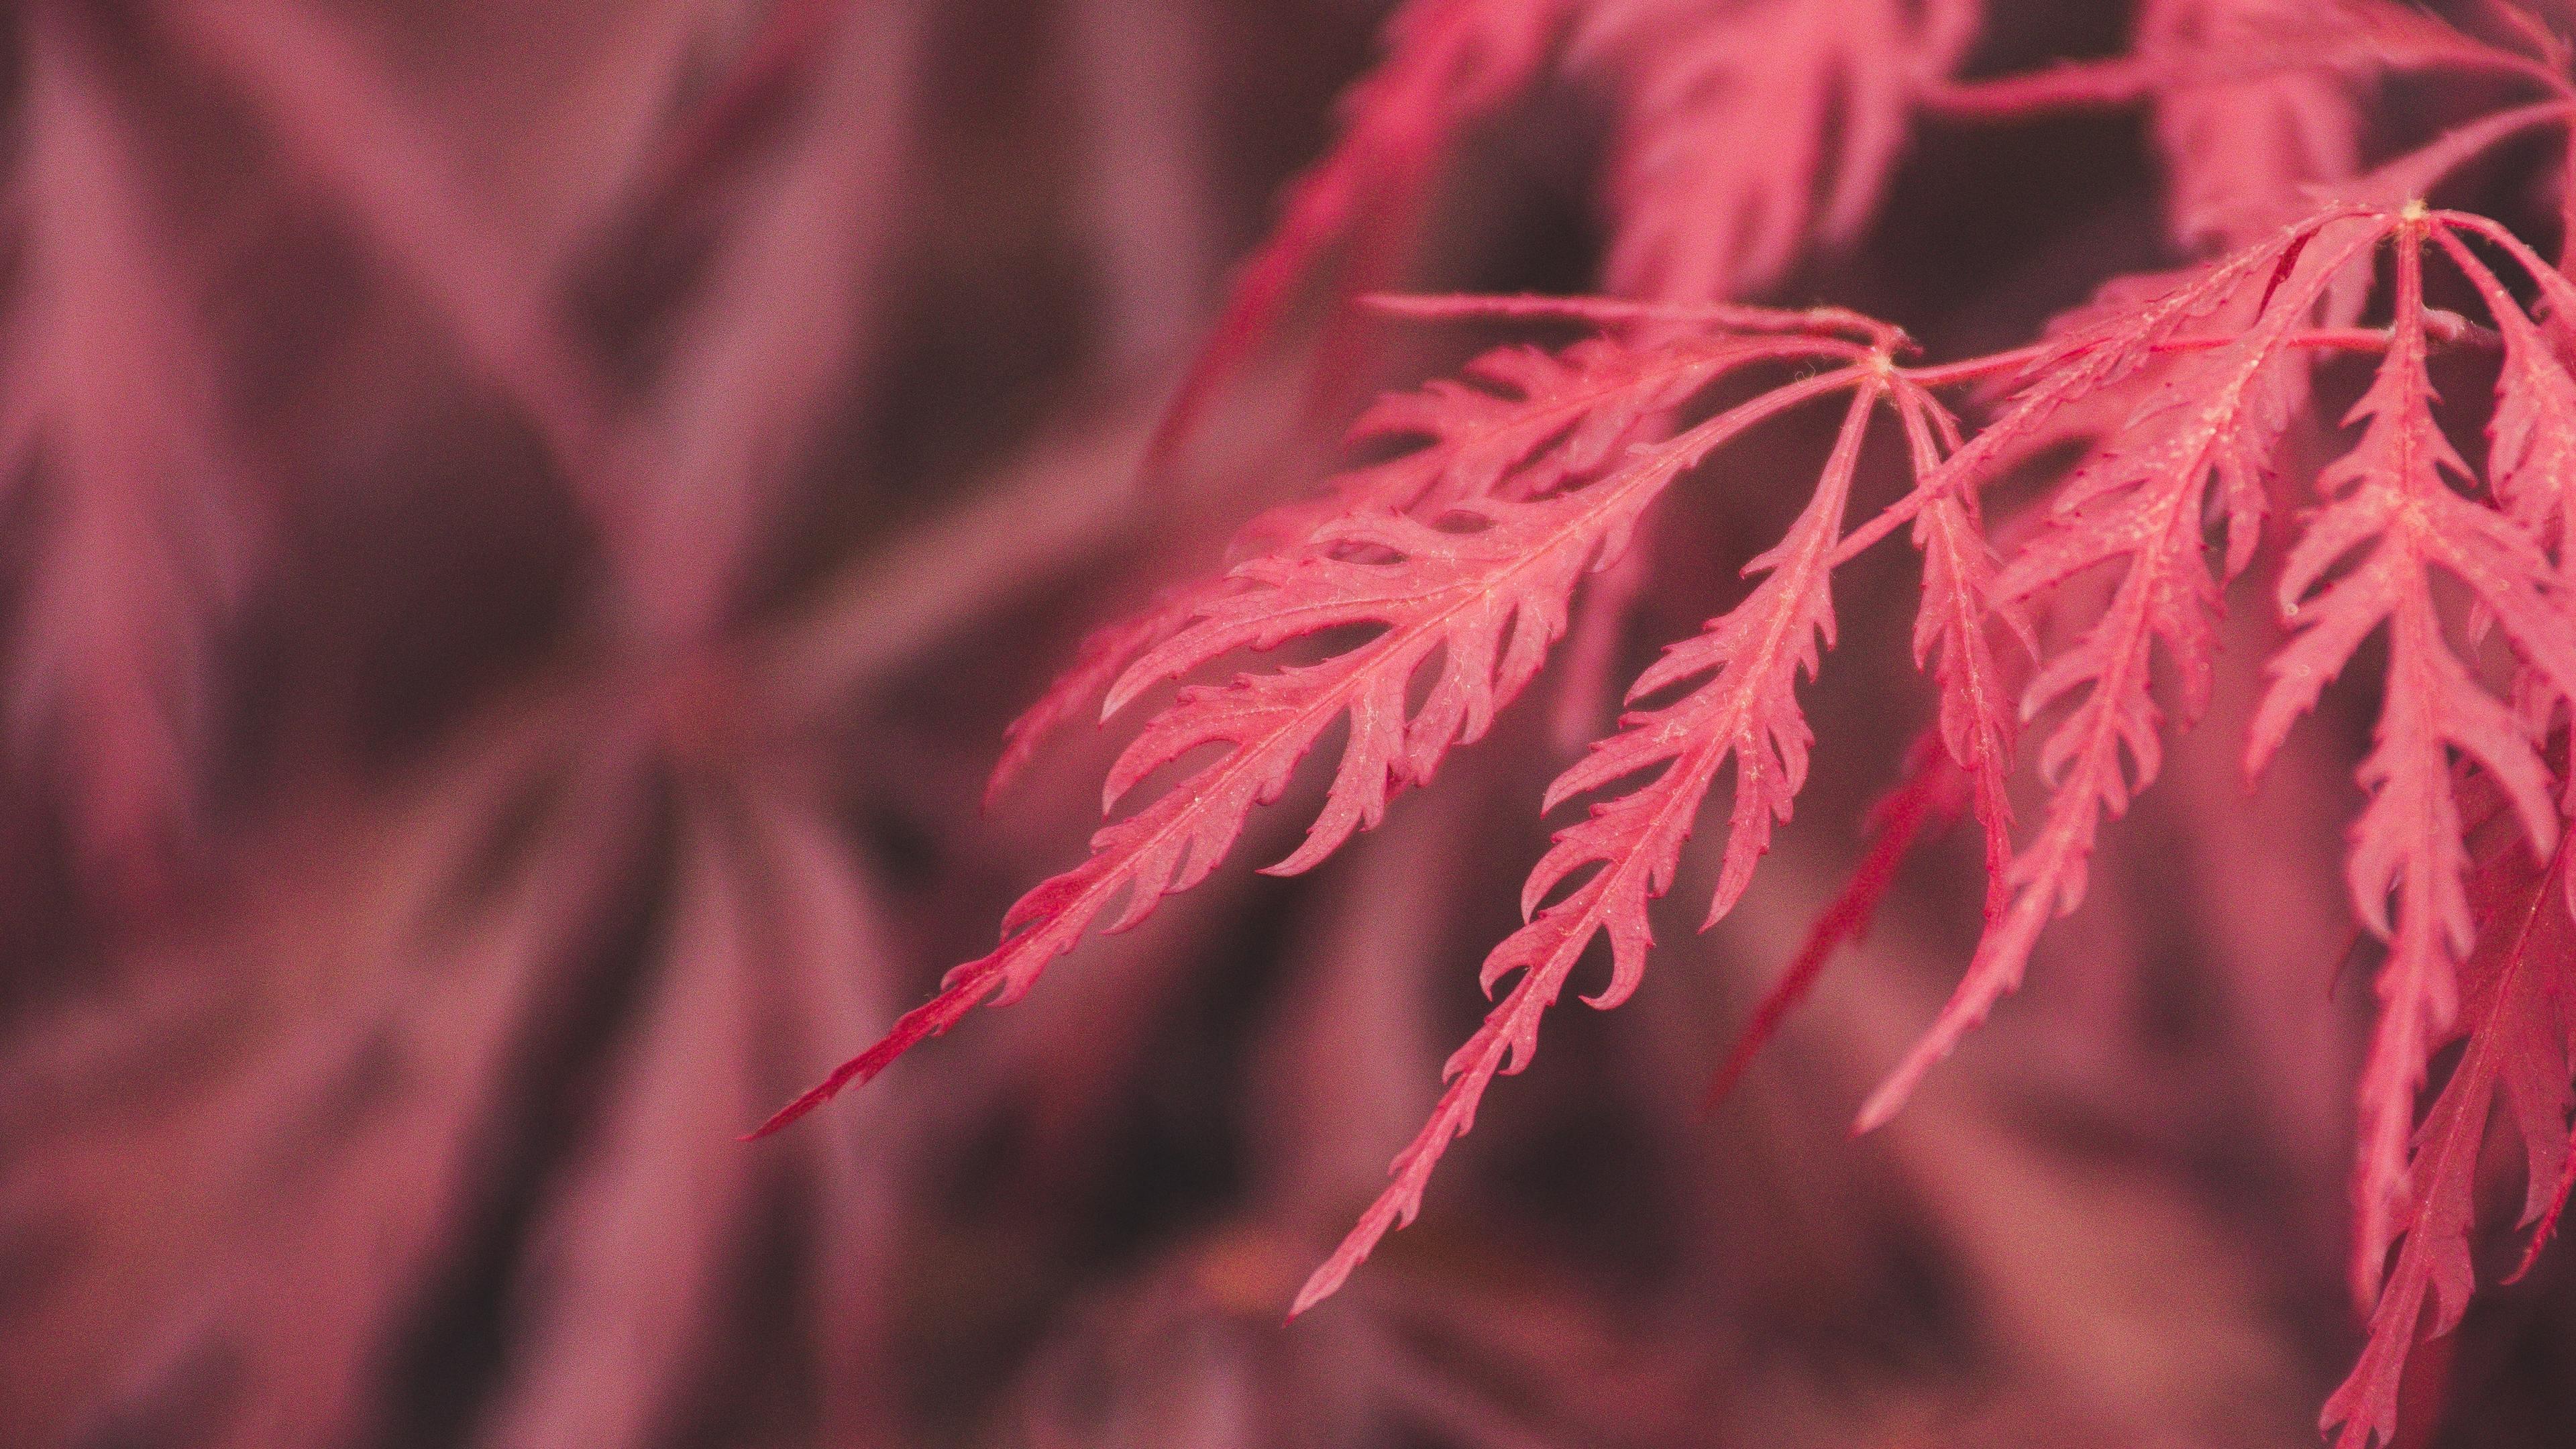 red leaf macro 4k 1540141123 - Red Leaf Macro 4k - red wallpapers, photography wallpapers, nature wallpapers, macro wallpapers, leaf wallpapers, hd-wallpapers, 4k-wallpapers